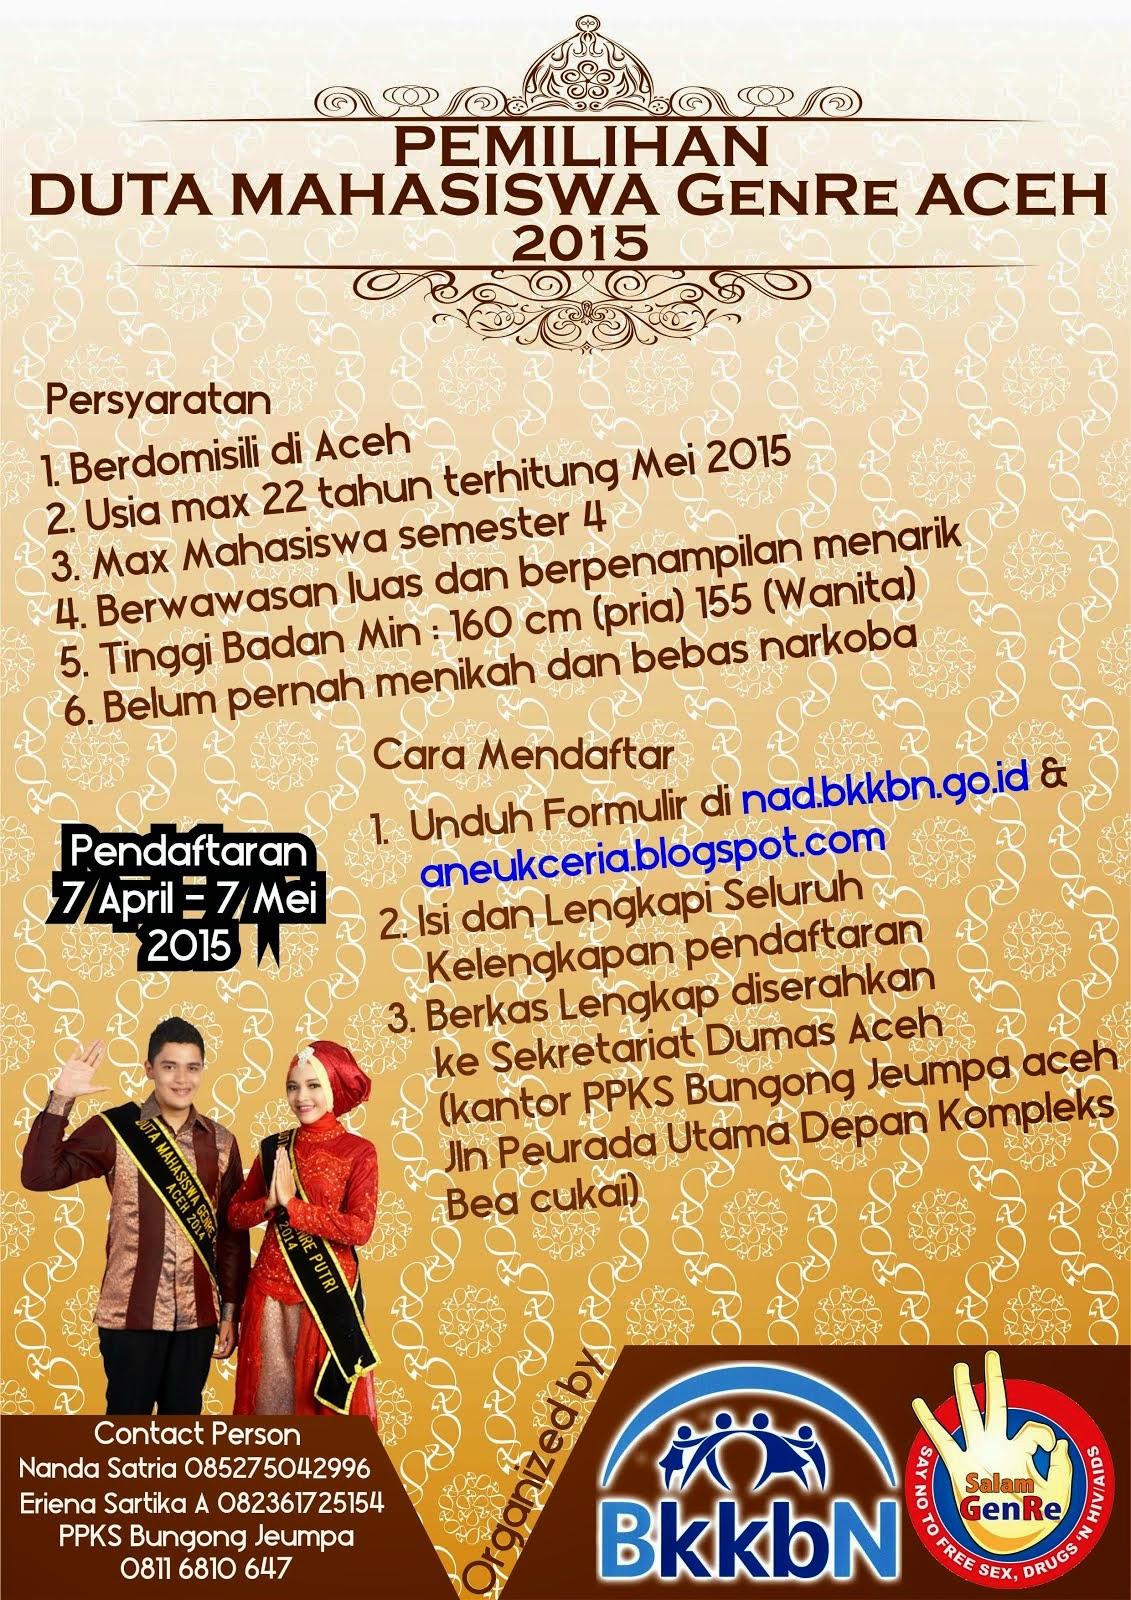 Pemilihan Dumas GenRe Aceh 2015